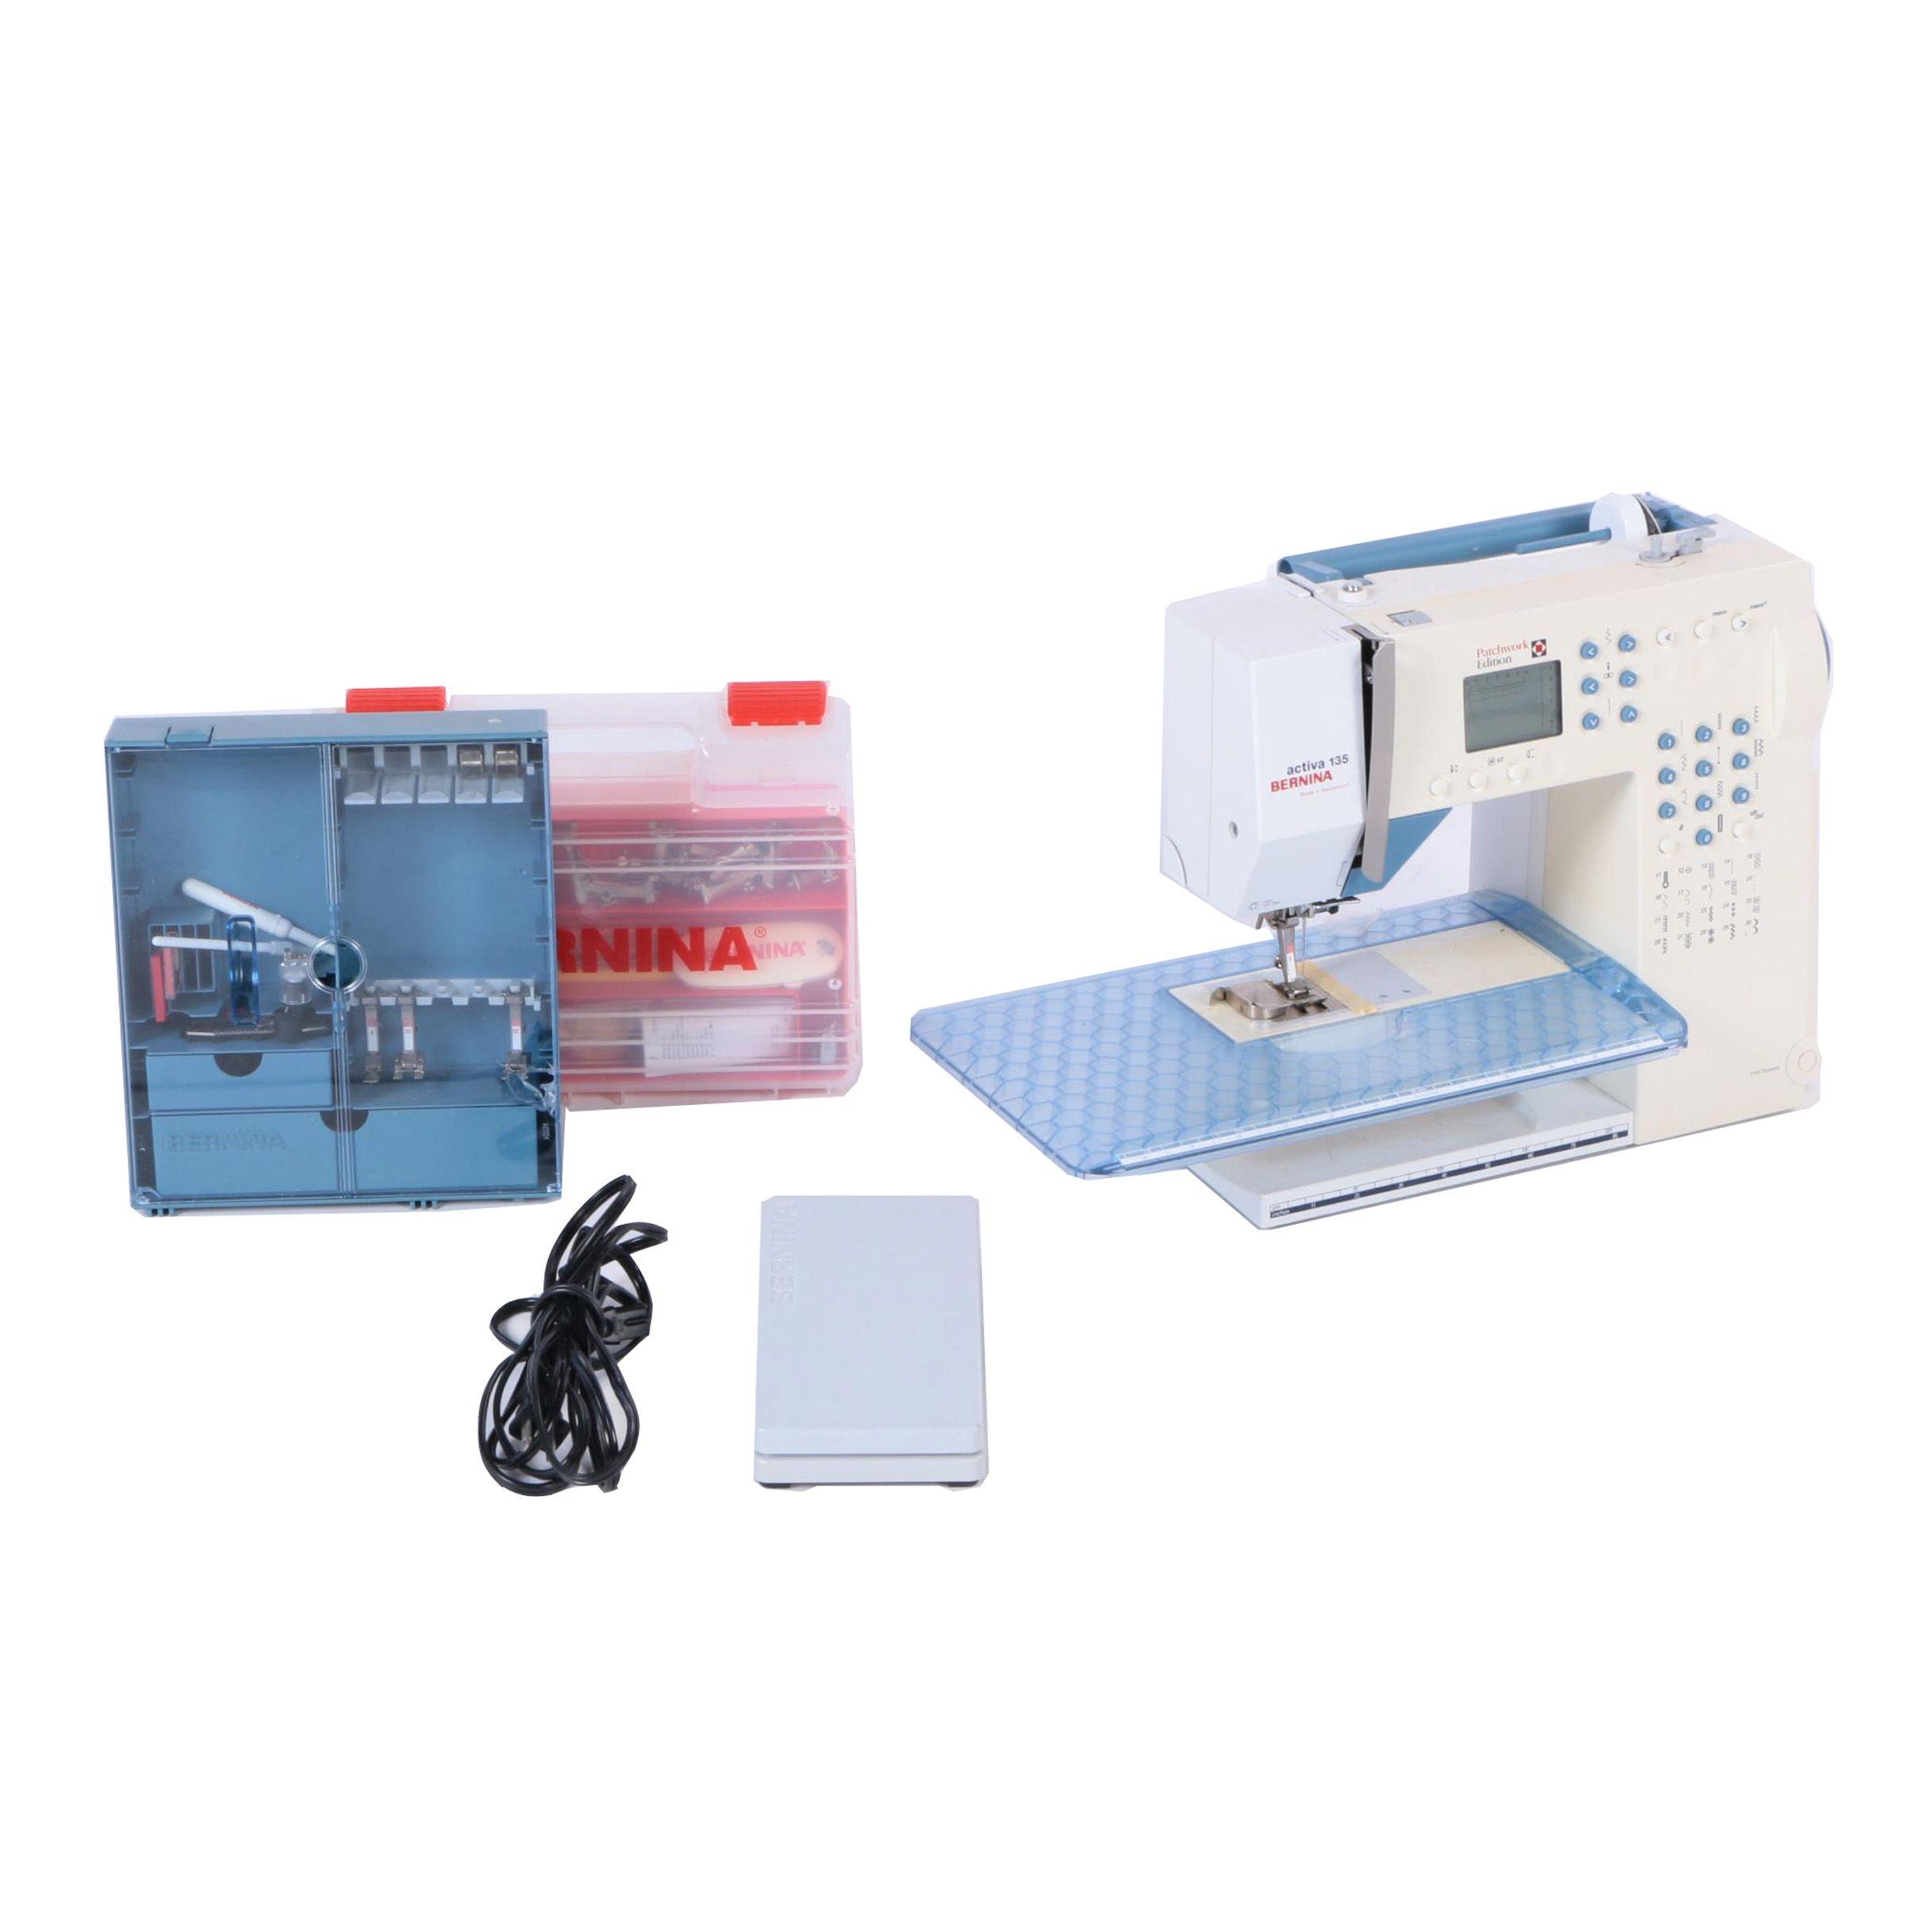 Bernina Sewing Machine and Accessories